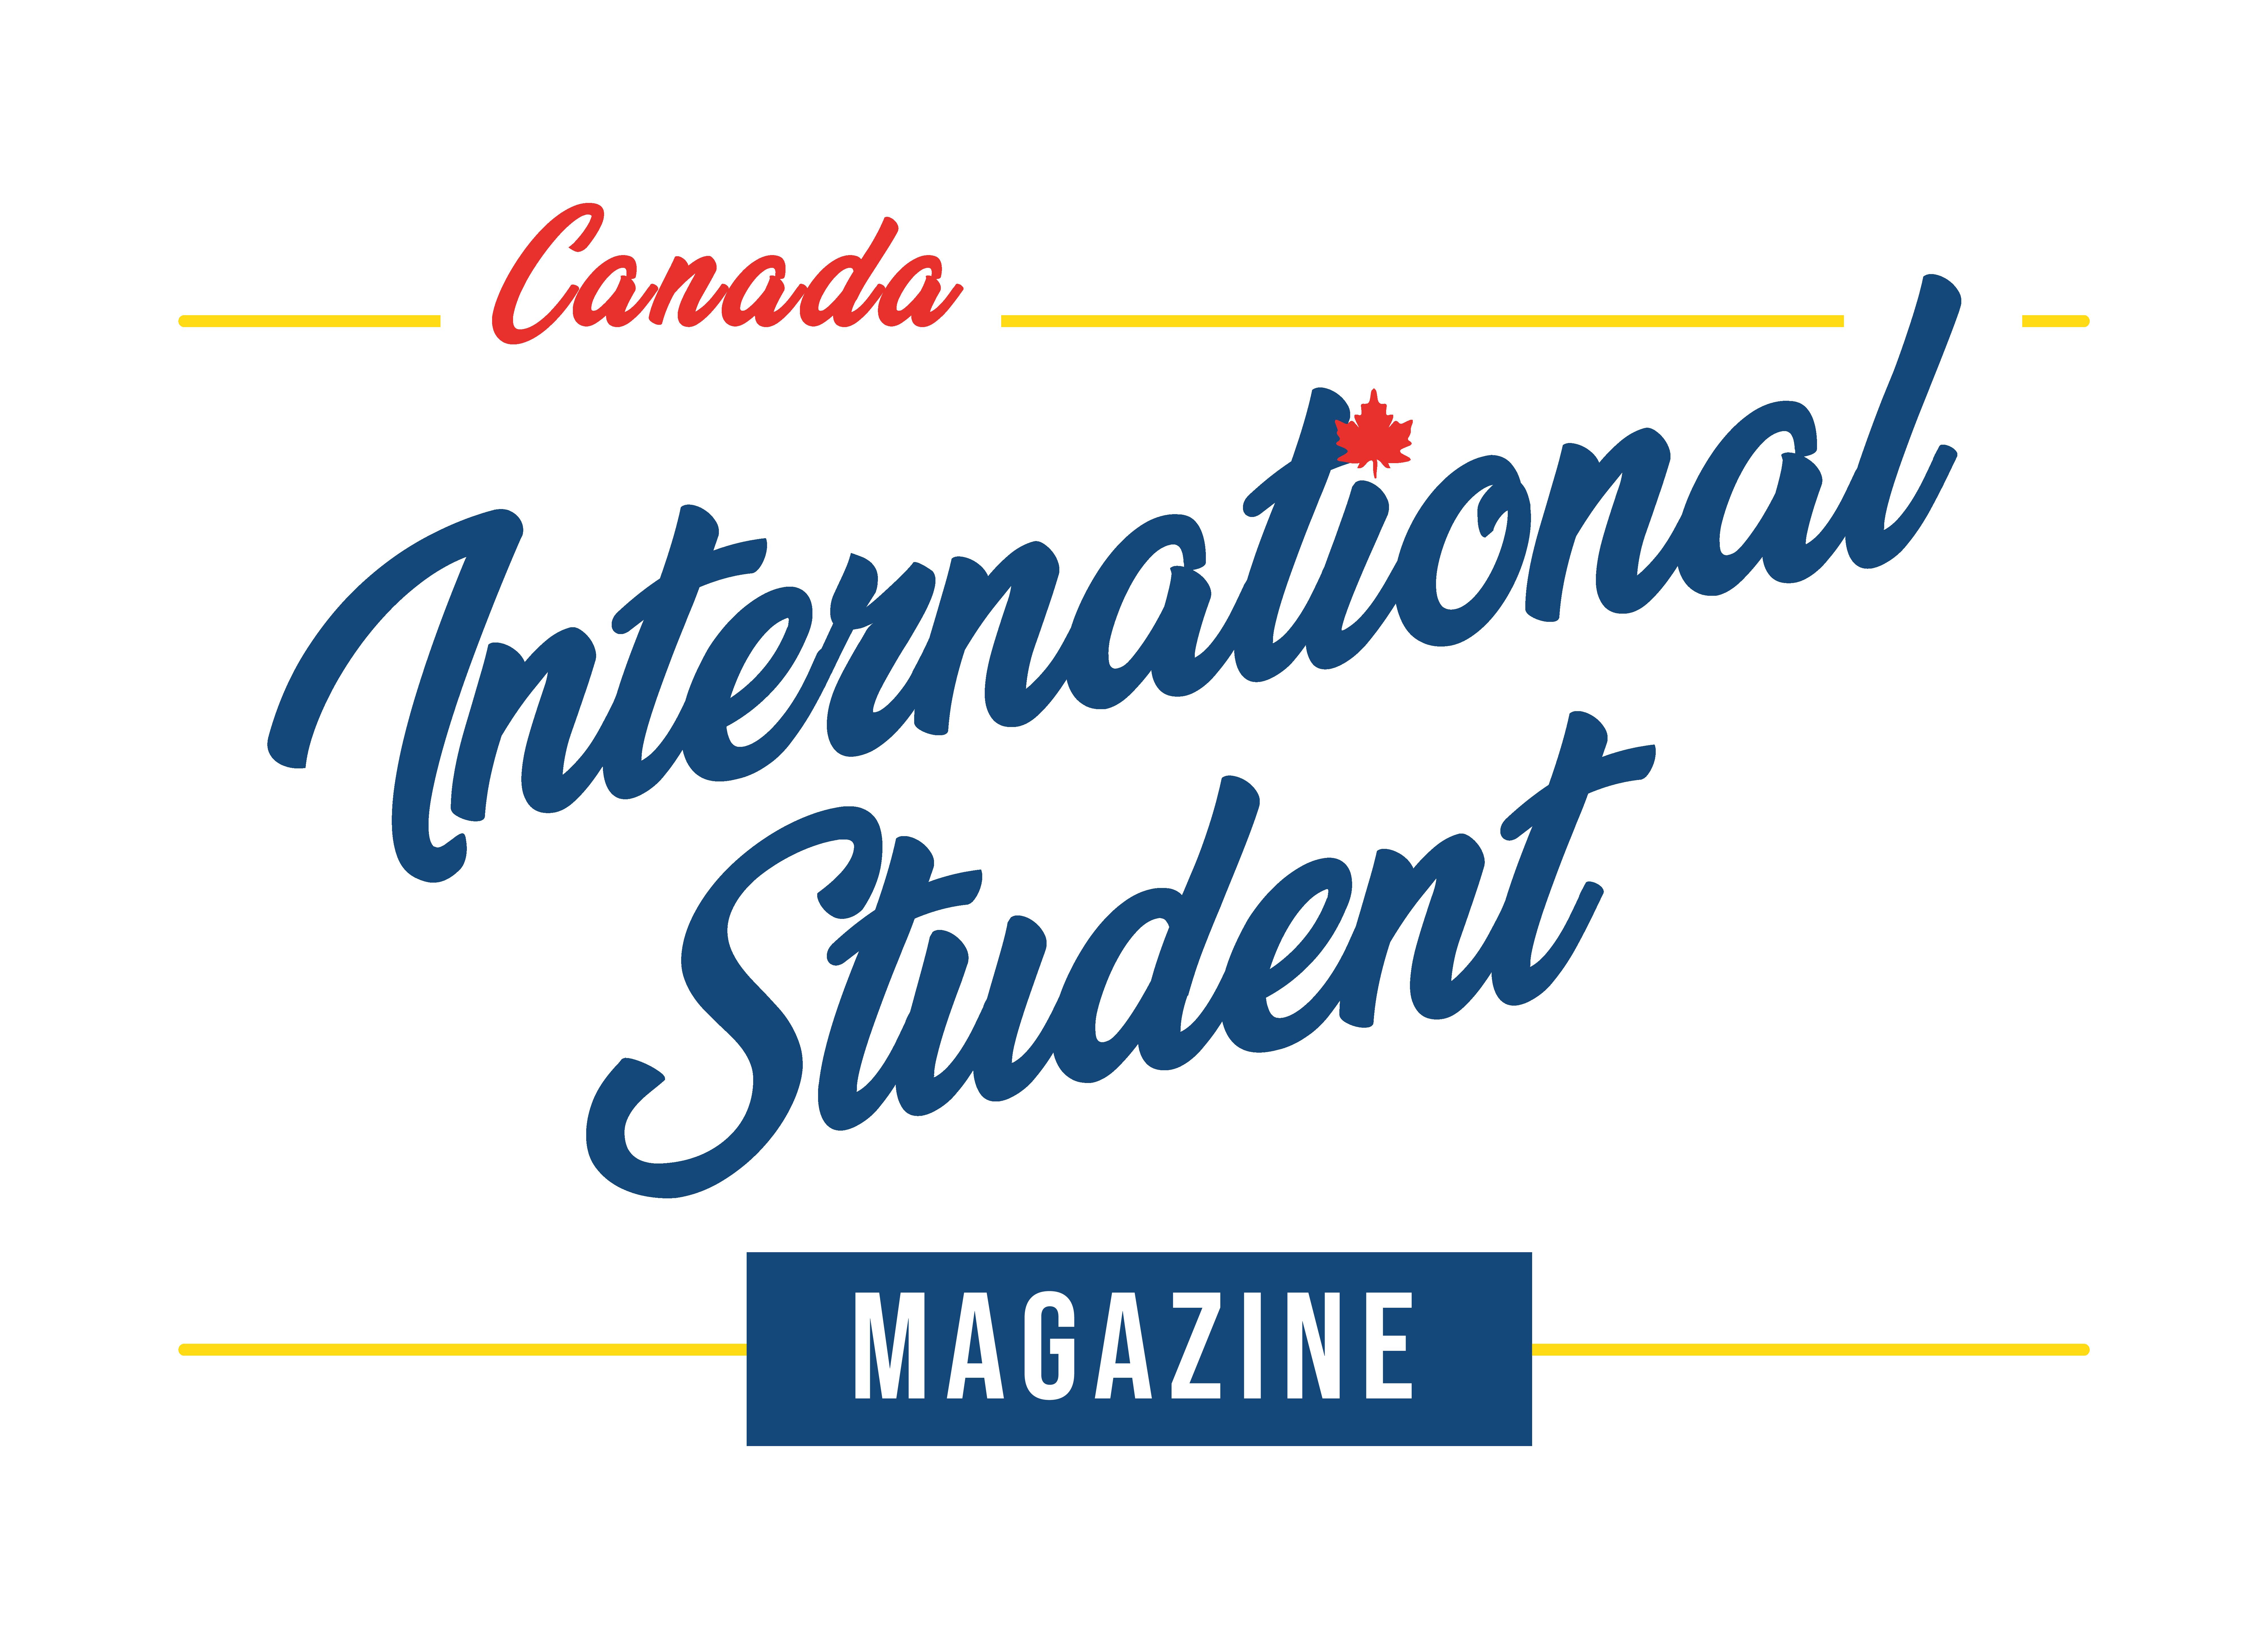 Canada International Student Magazine Logo